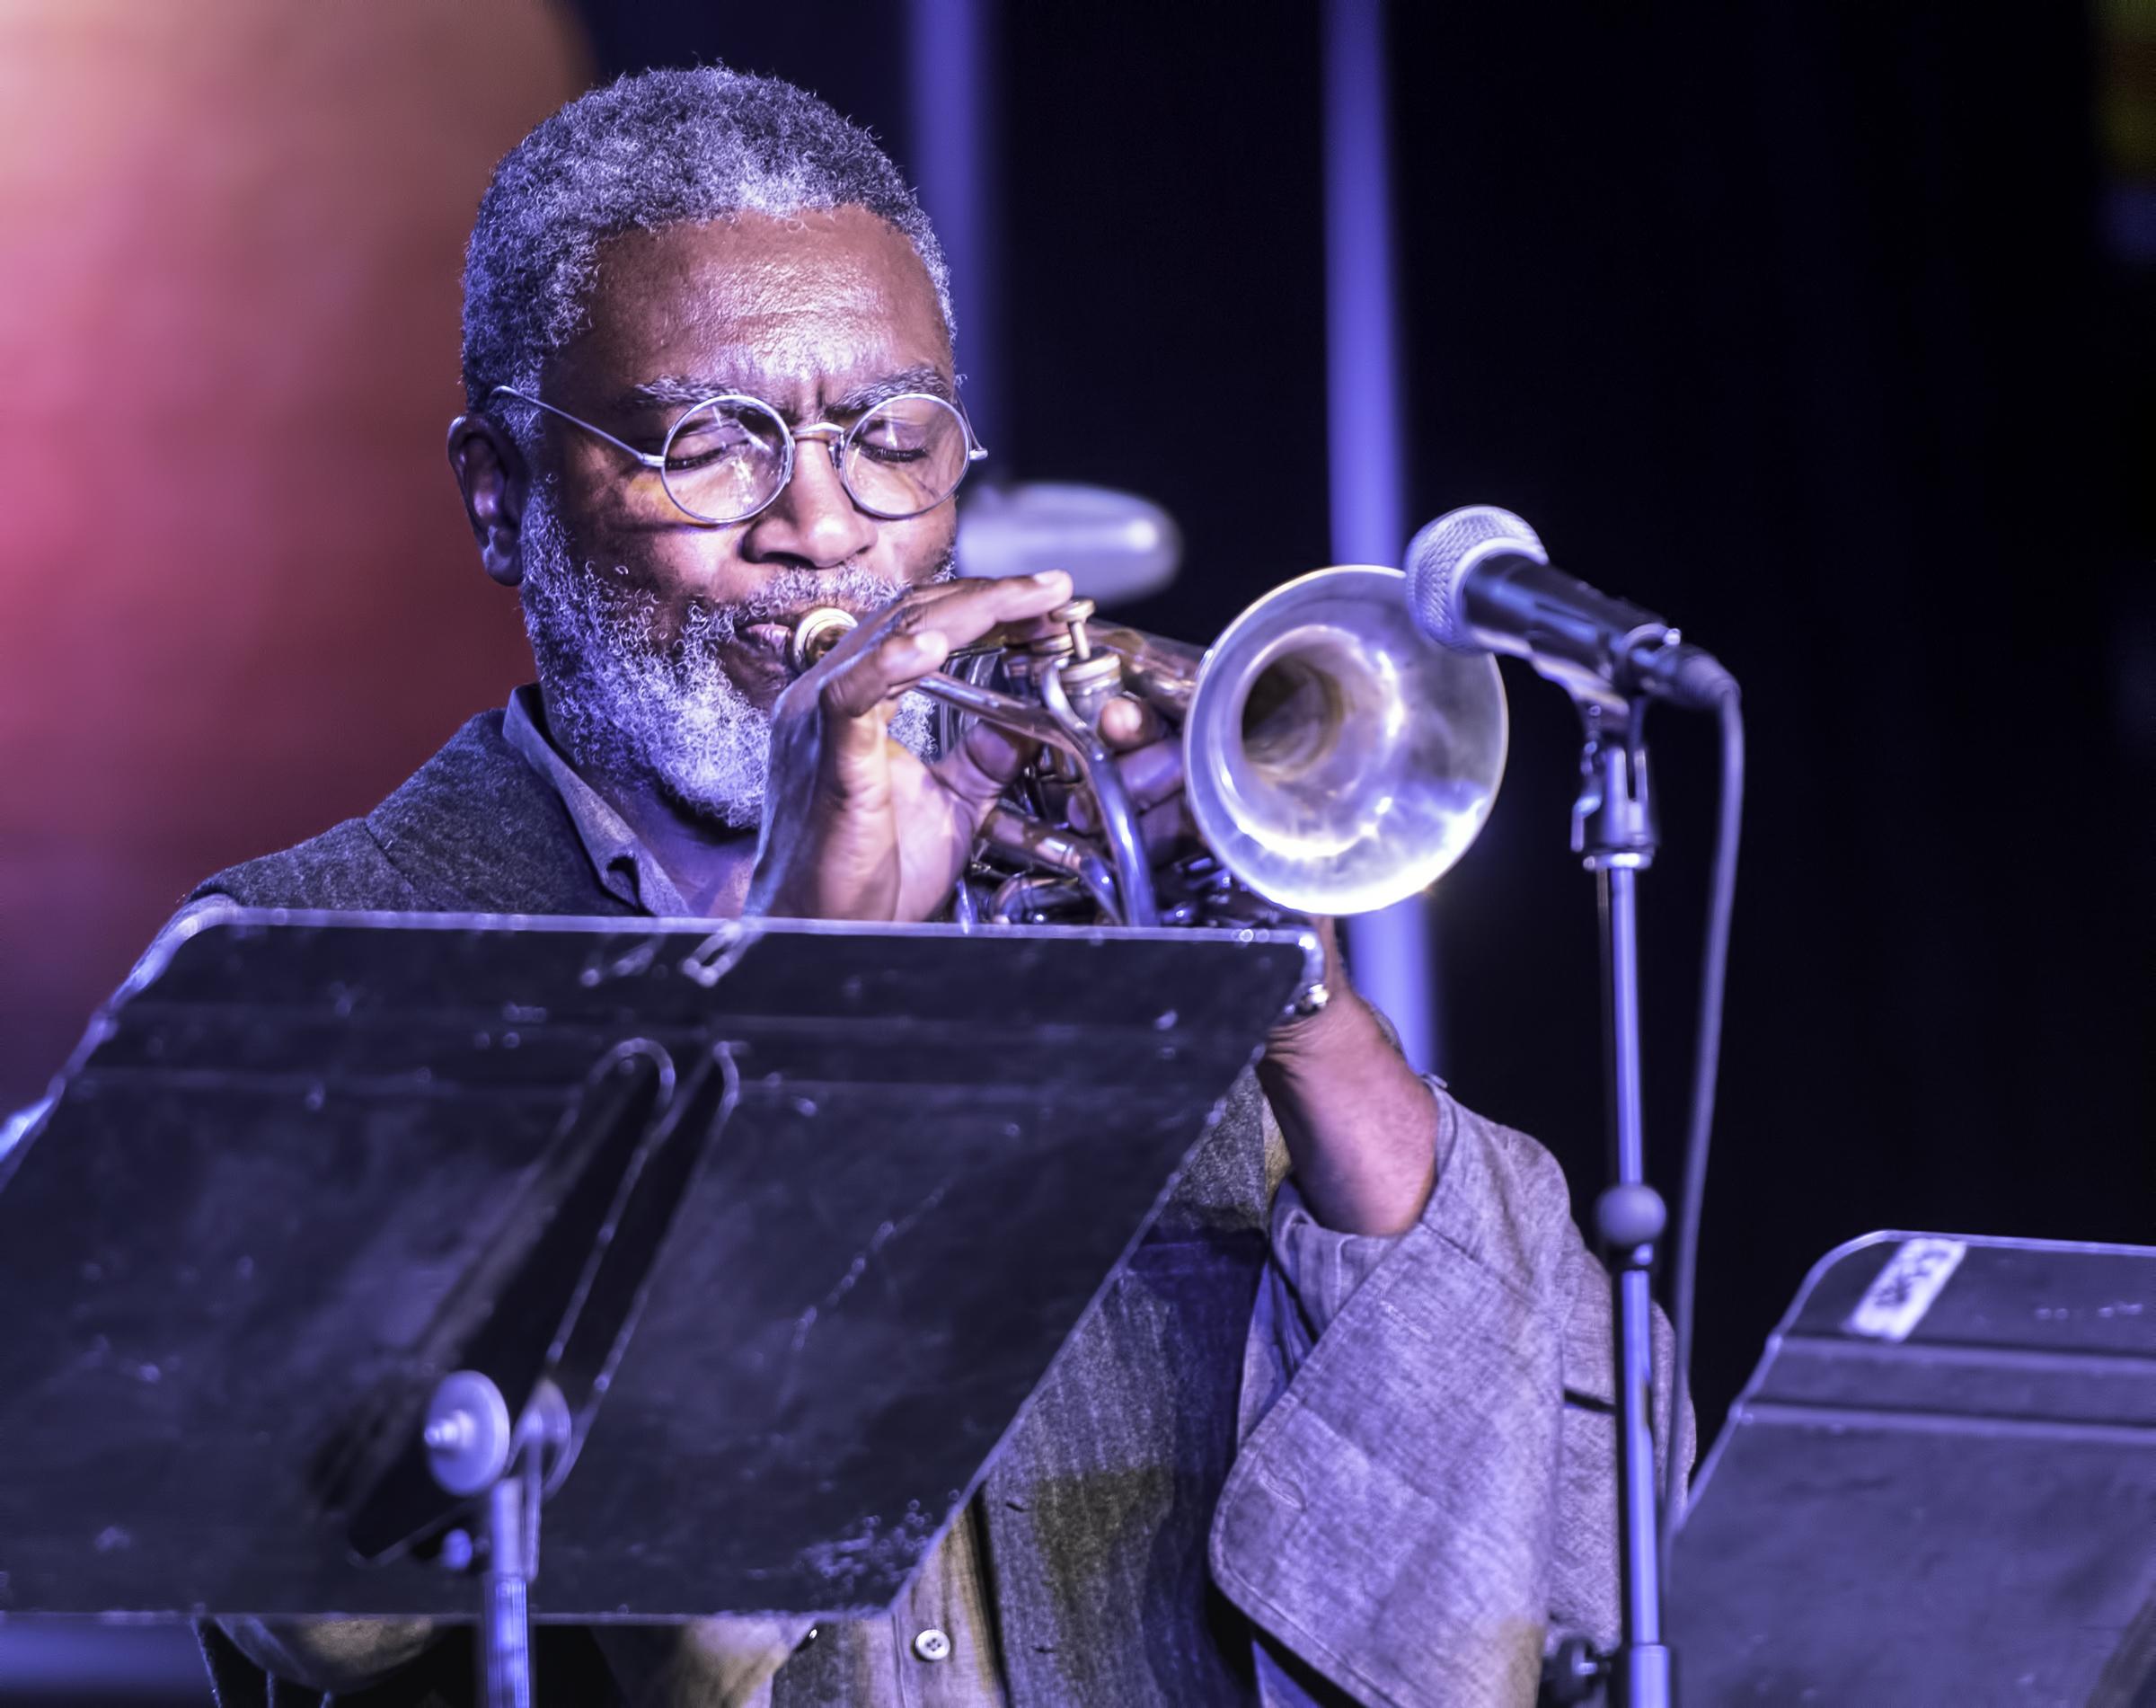 Graham Haynes with the Vijay Iyer Sextet at the Monterey Jazz Festival